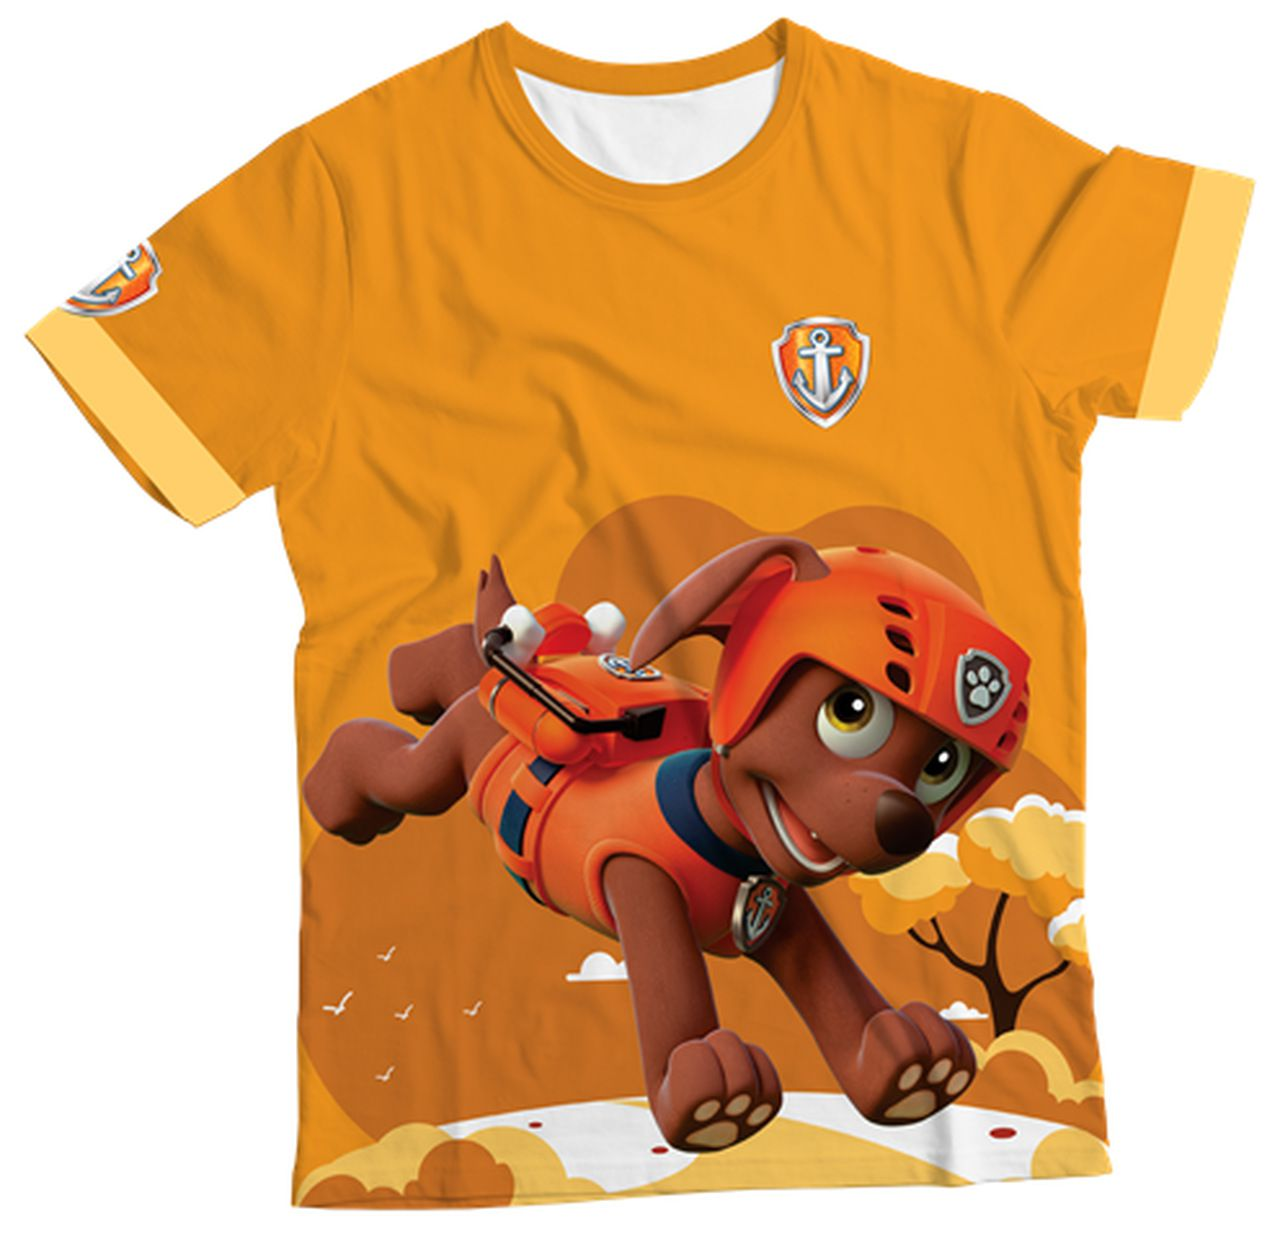 Camiseta Zuma Patrulha Canina Mcdvmcamiseta Manga Curta